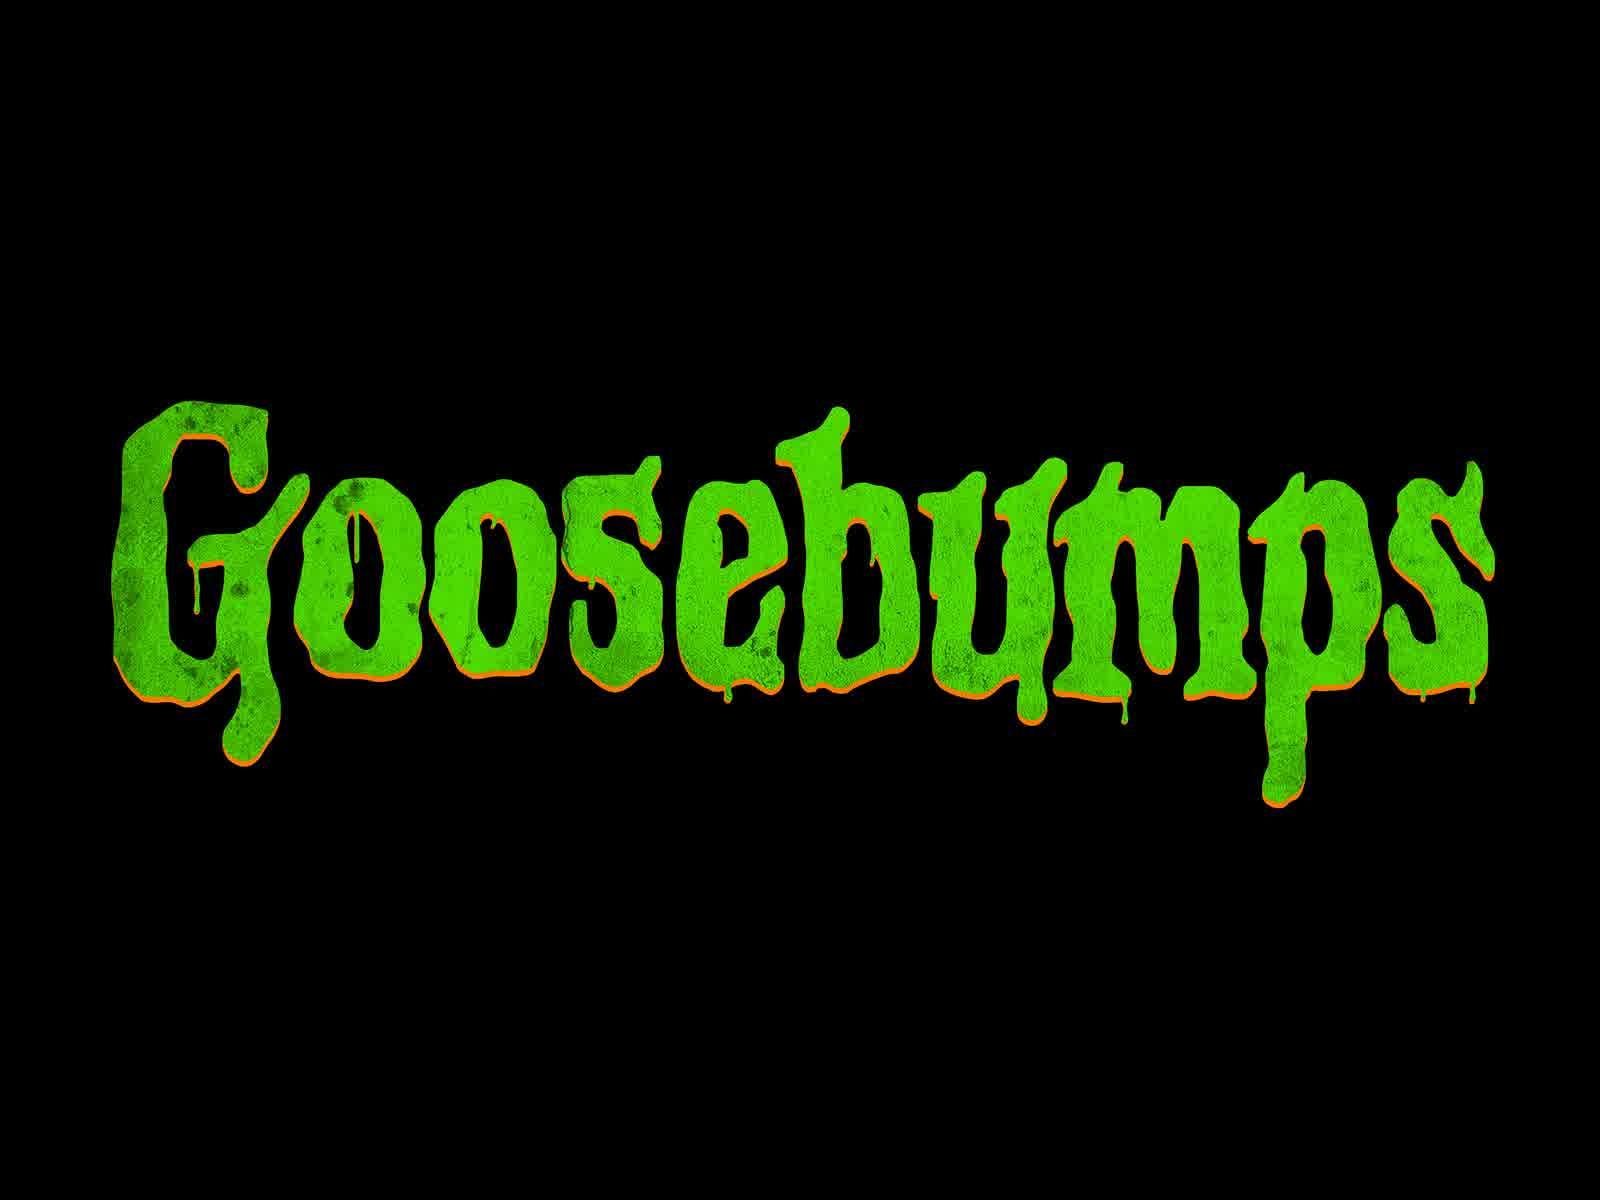 Goosebumps wallpapers 79 wallpapers wallpapers 4k - Goosebumps wallpaper ...